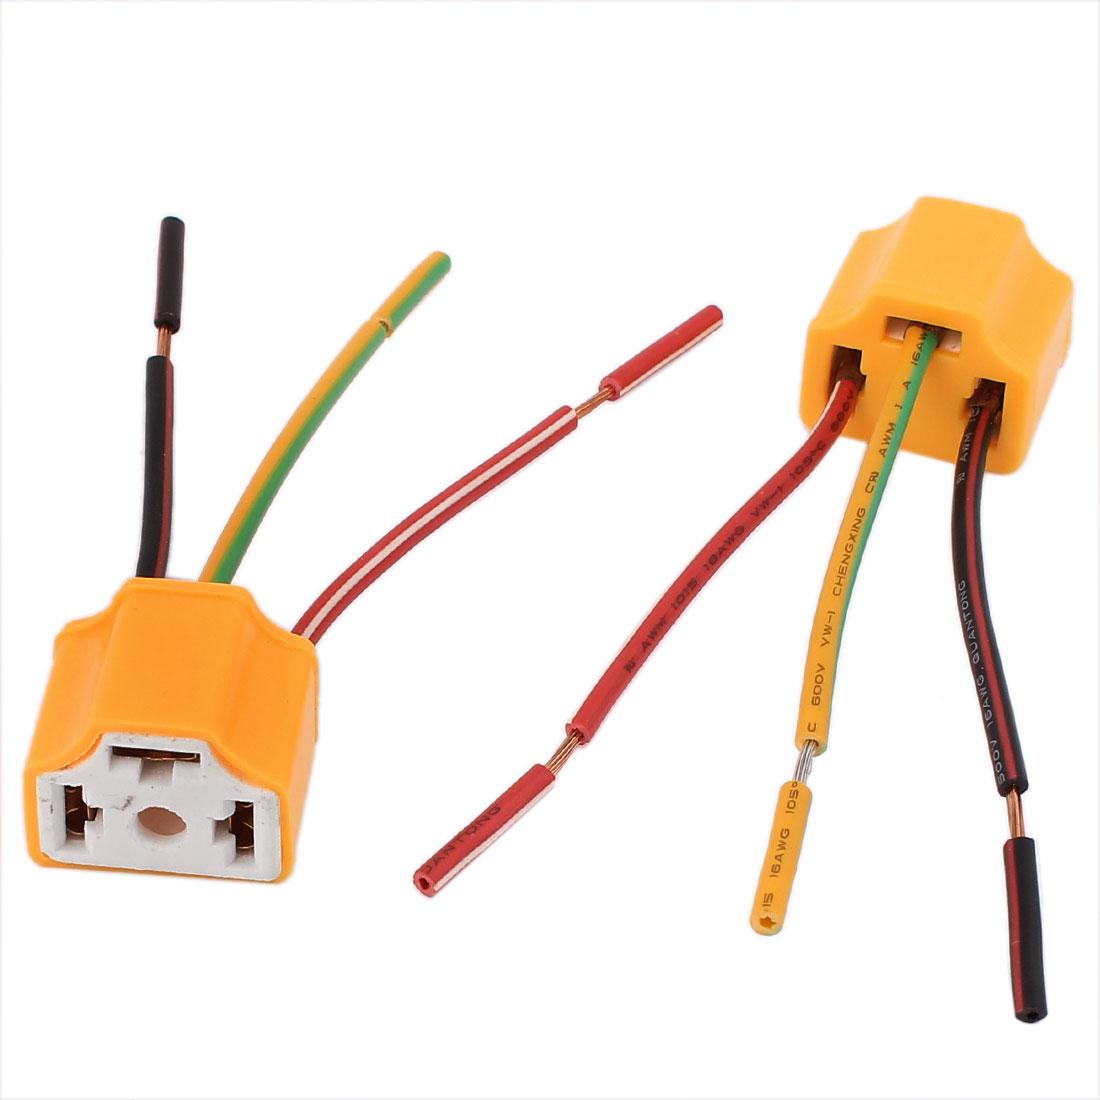 2Pcs Auto Car Truck Ceramic Headlight Connector H4 Light Lamp Socket Yellow